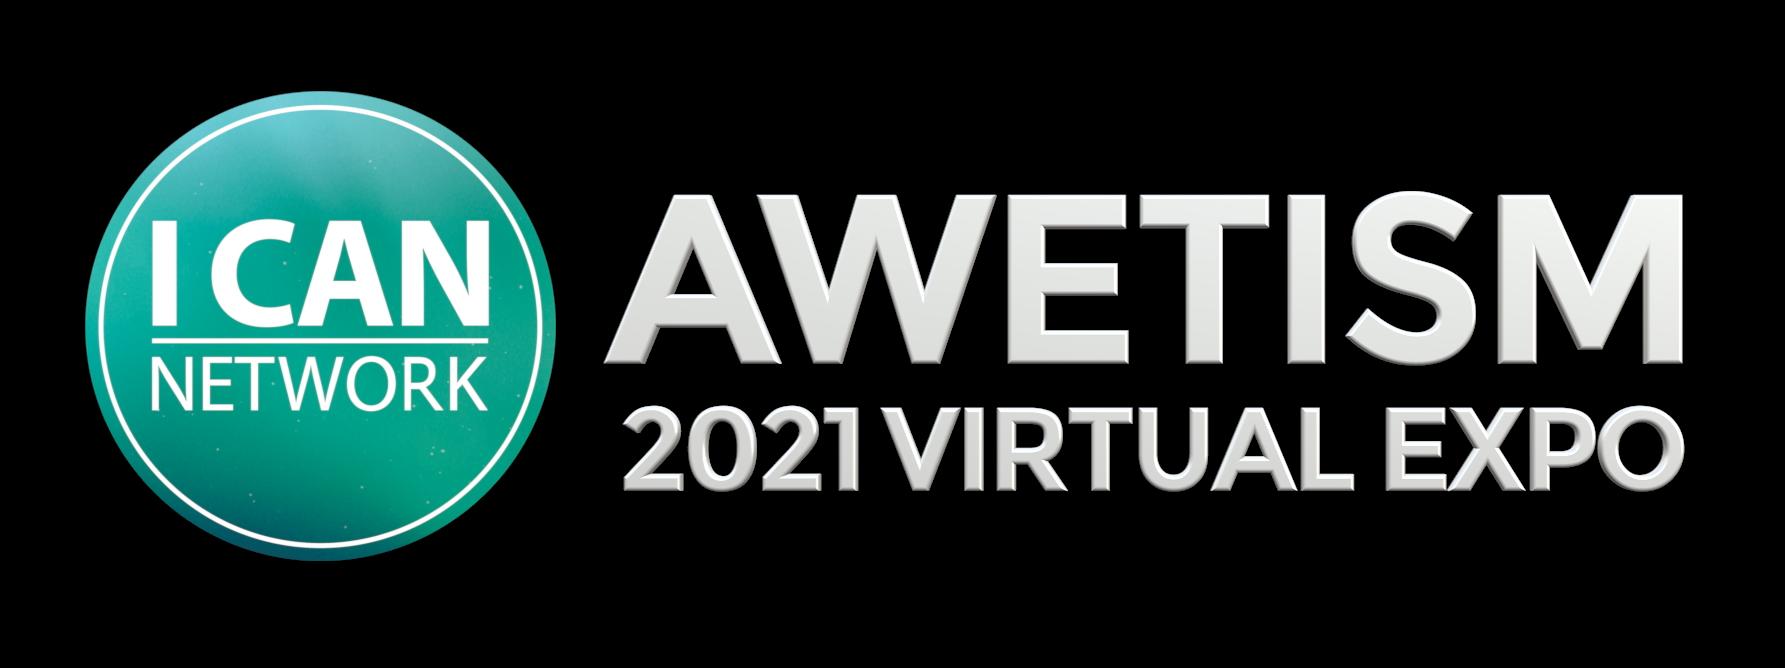 WETISM 2021 Logo Transparent